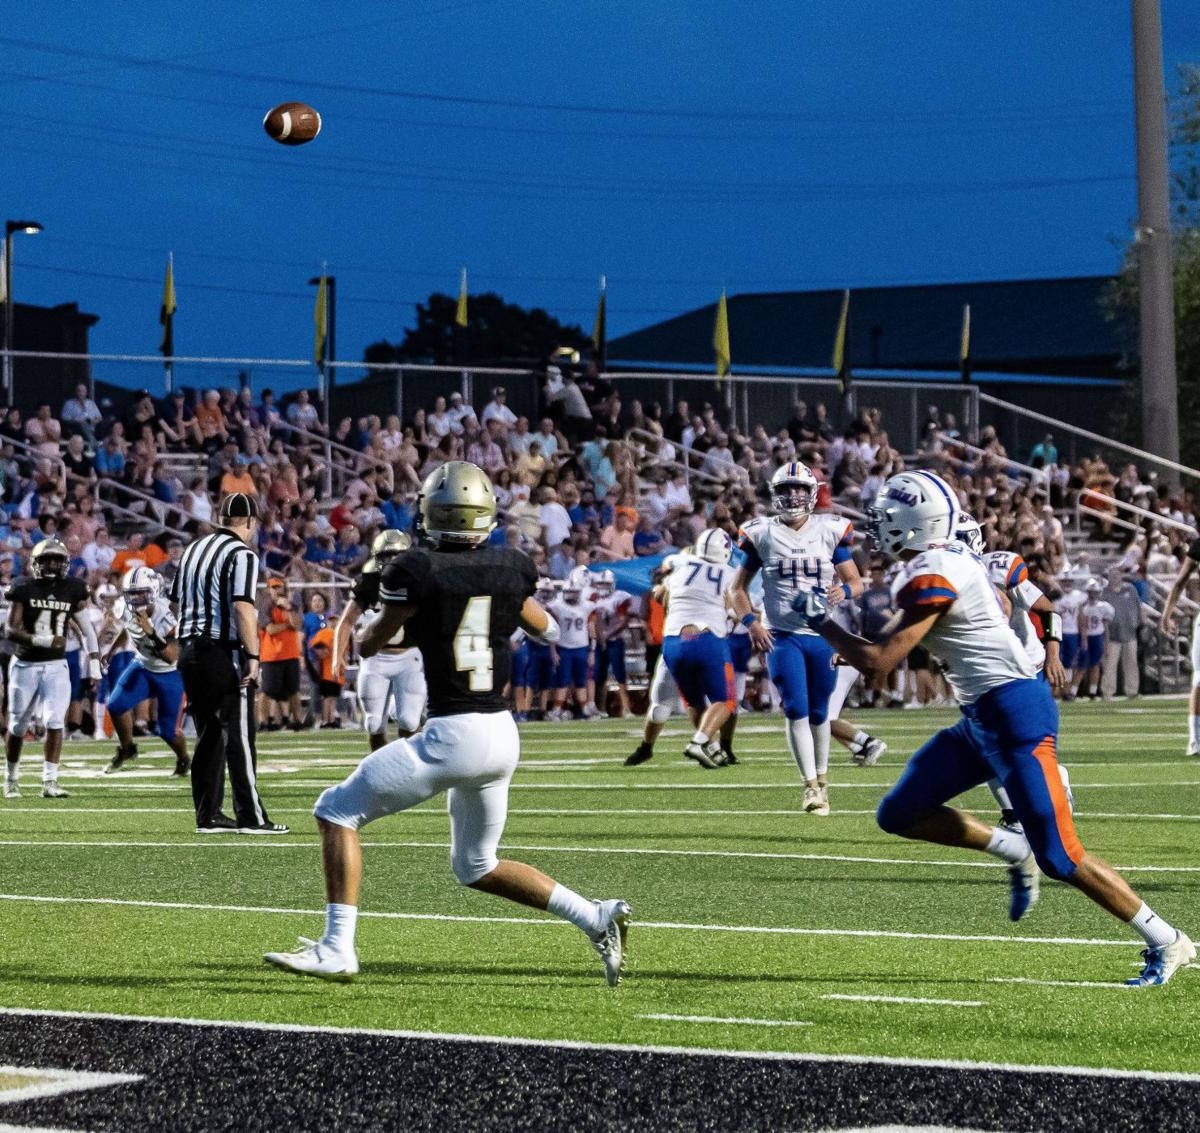 Calhoun Football Scrimmage 2.jpeg